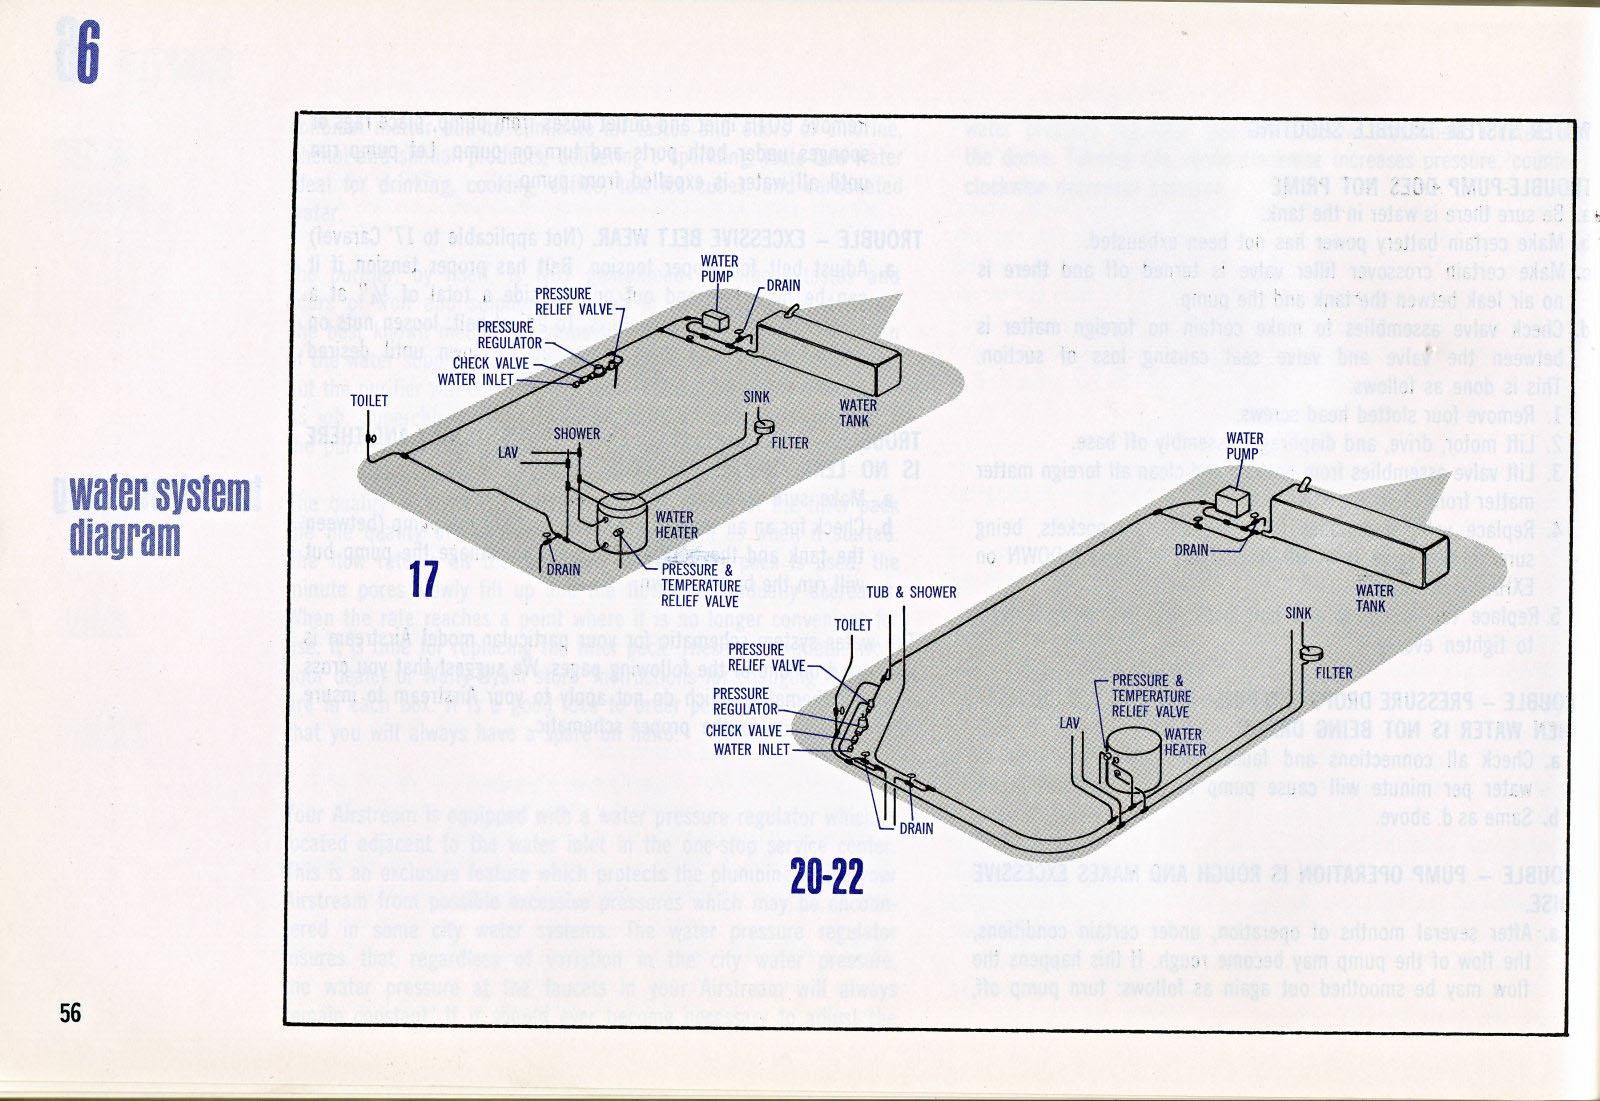 1994 Airstream Wiring Diagram Circuit Connection Vintage Camper 1972 31 Repair Frame Diagrams